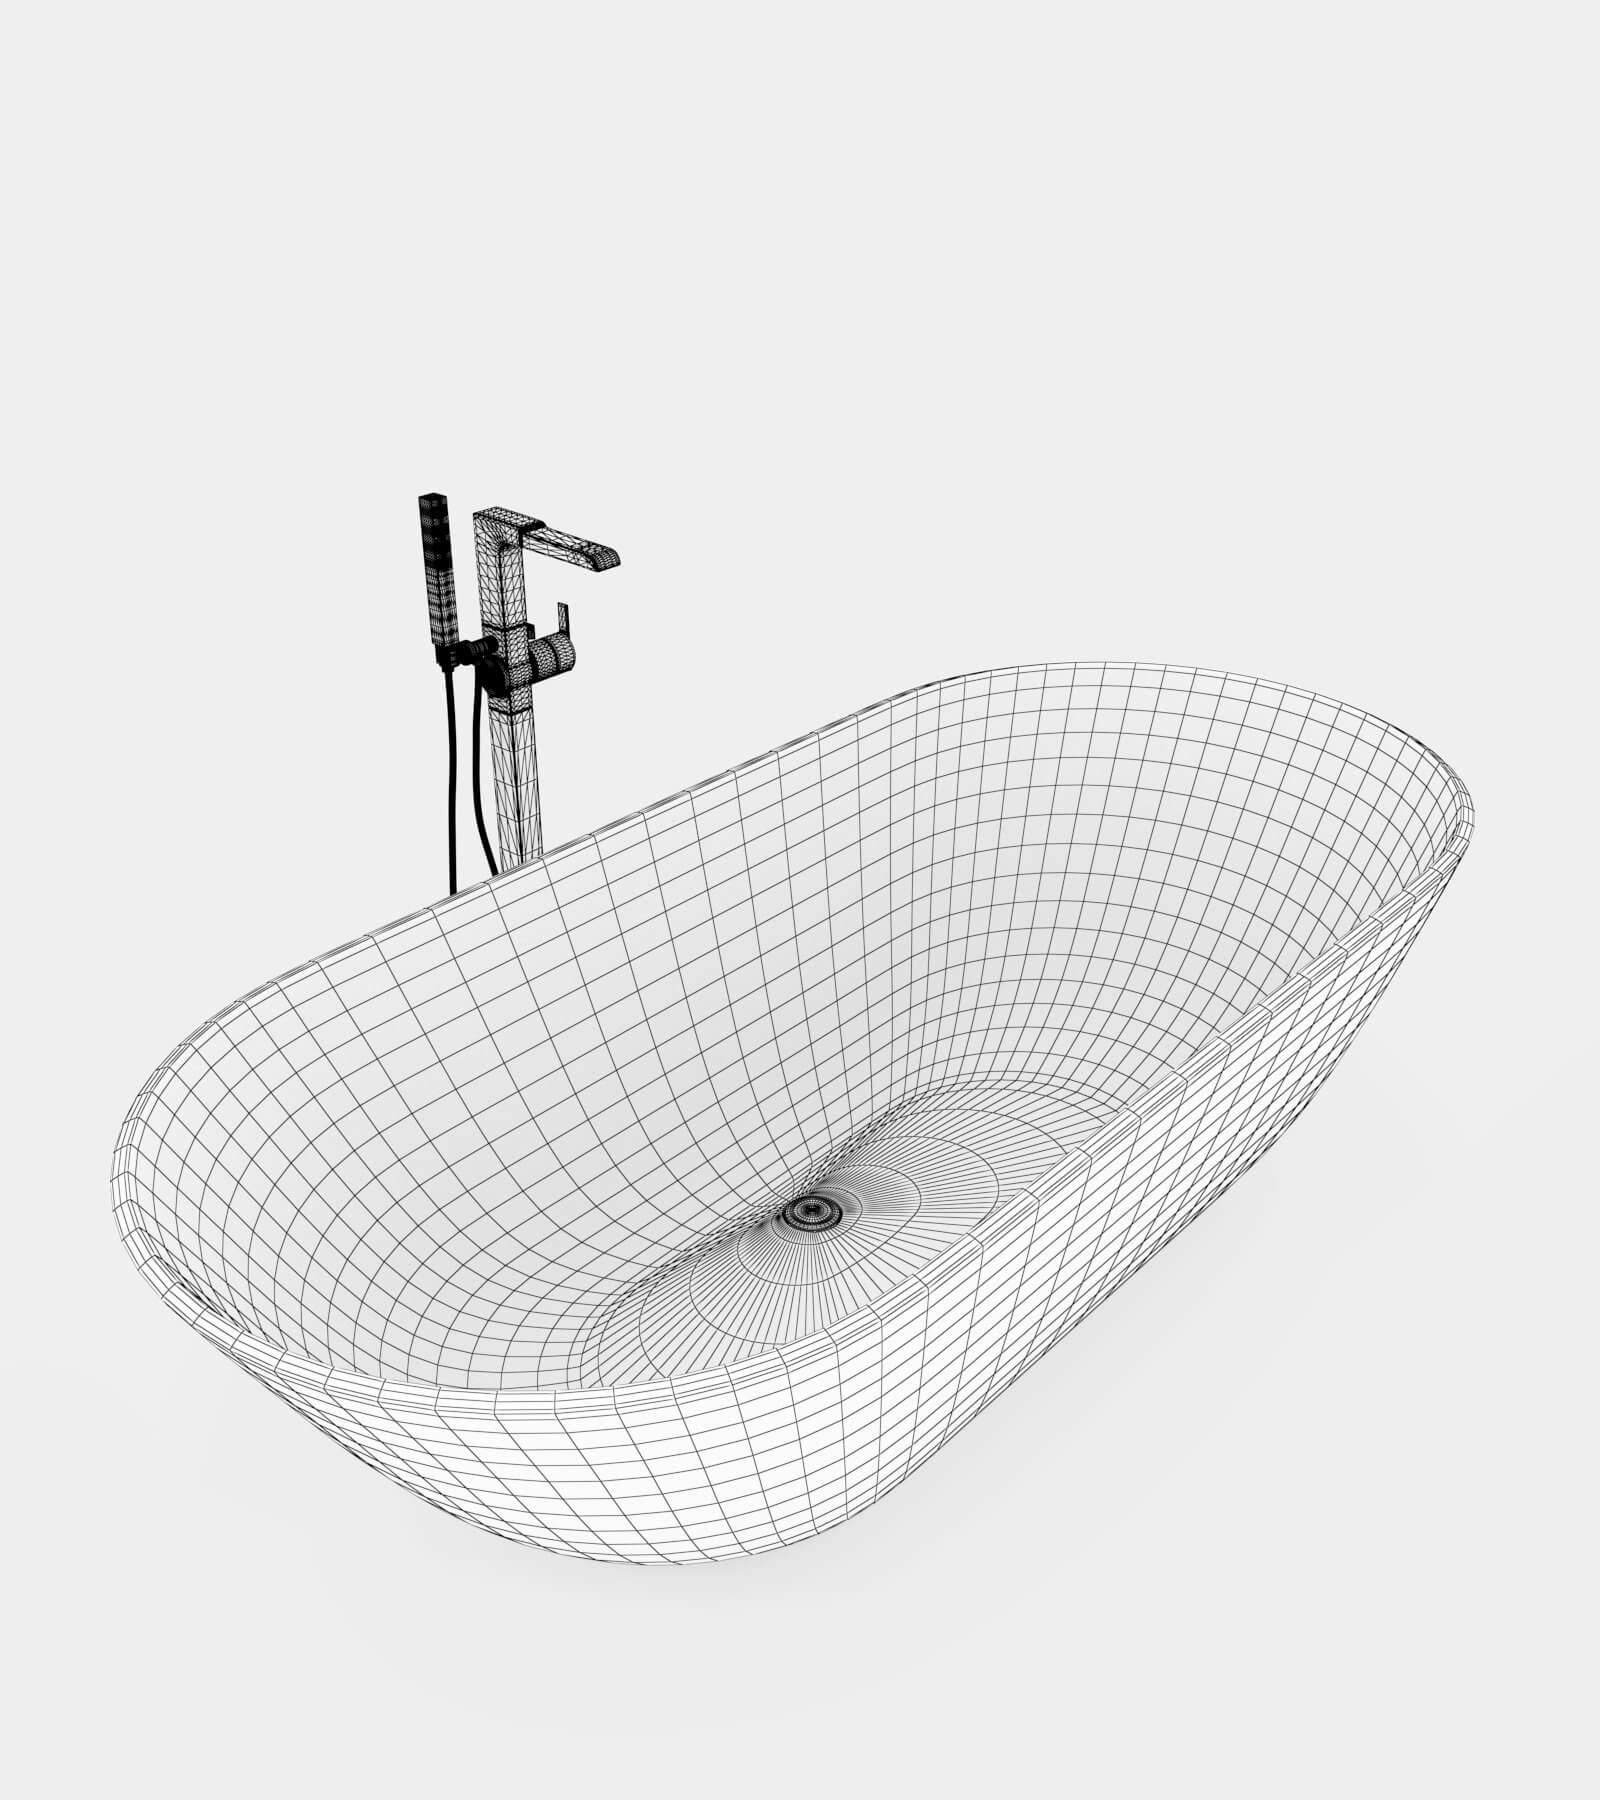 Bathroom Set-1-2-wire 3D Model